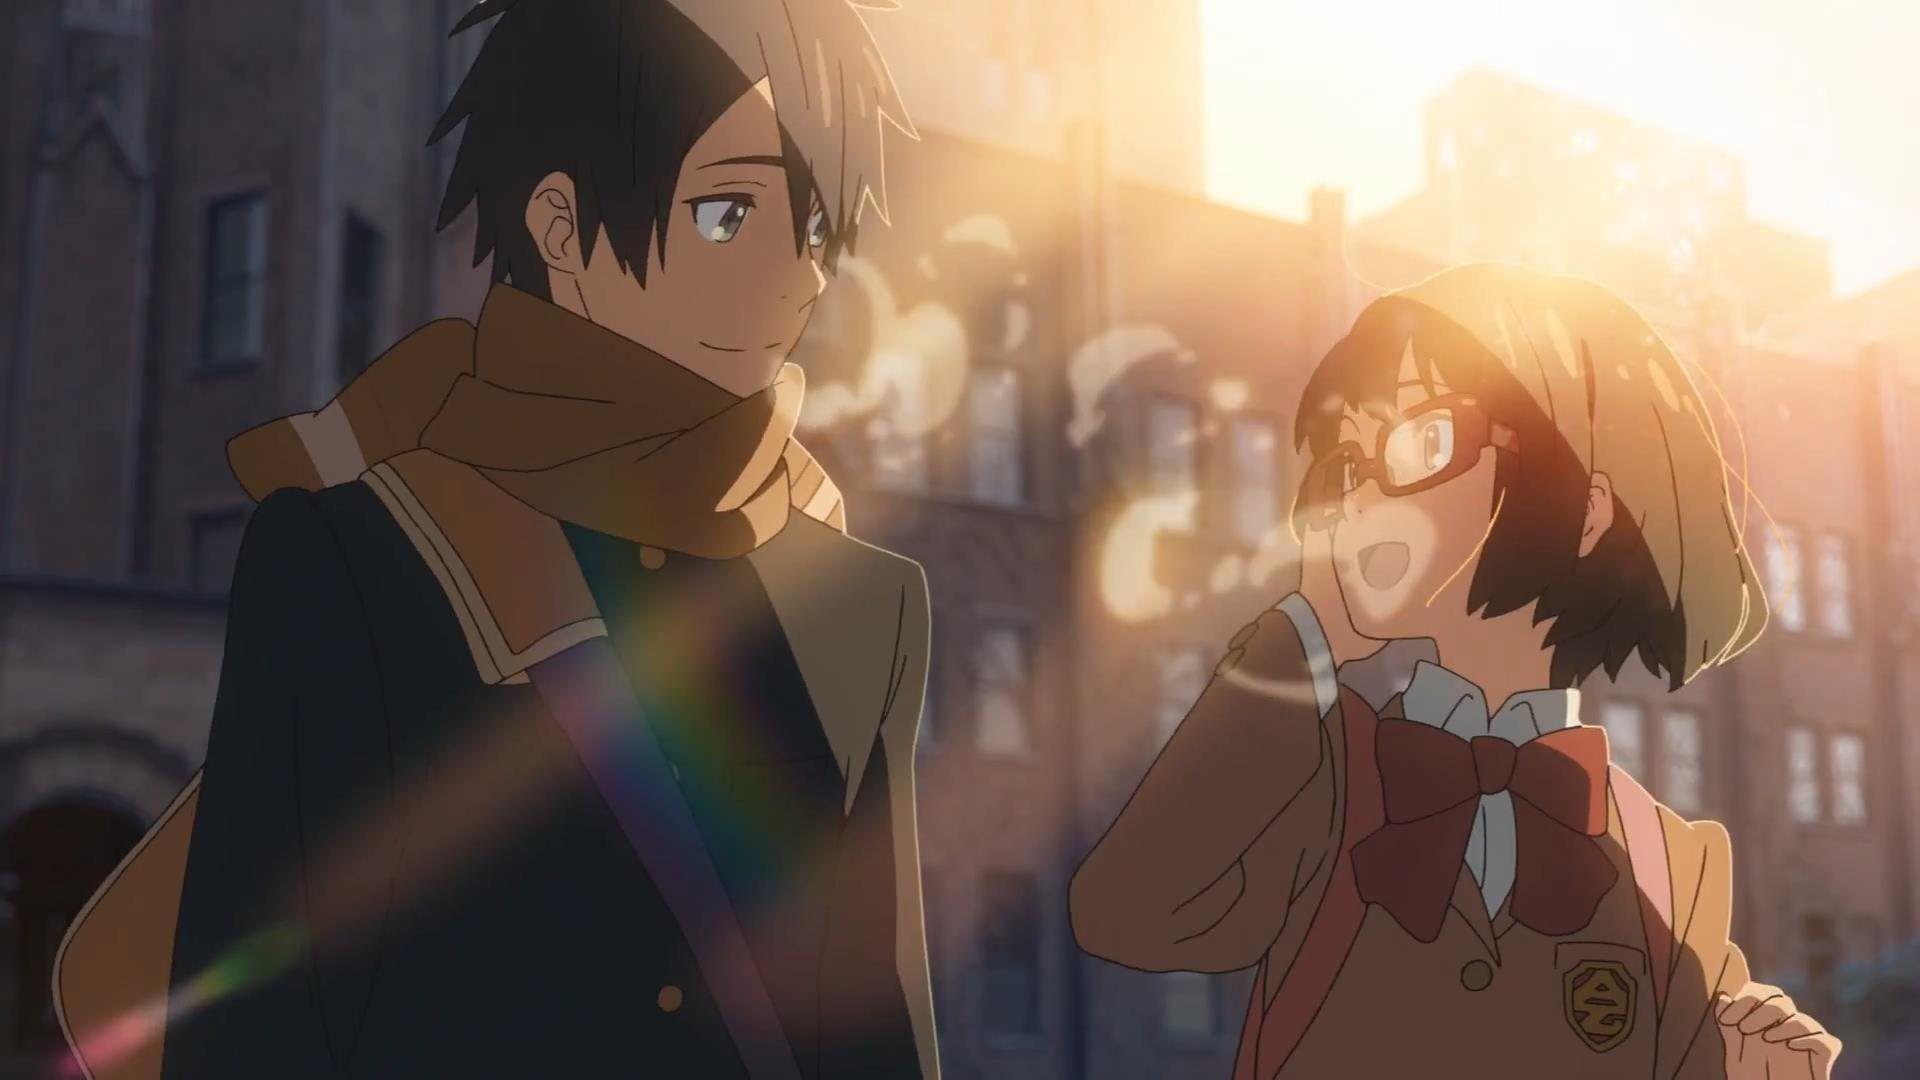 Cross Road Anime Full Promo English Subtitled [1080p] in